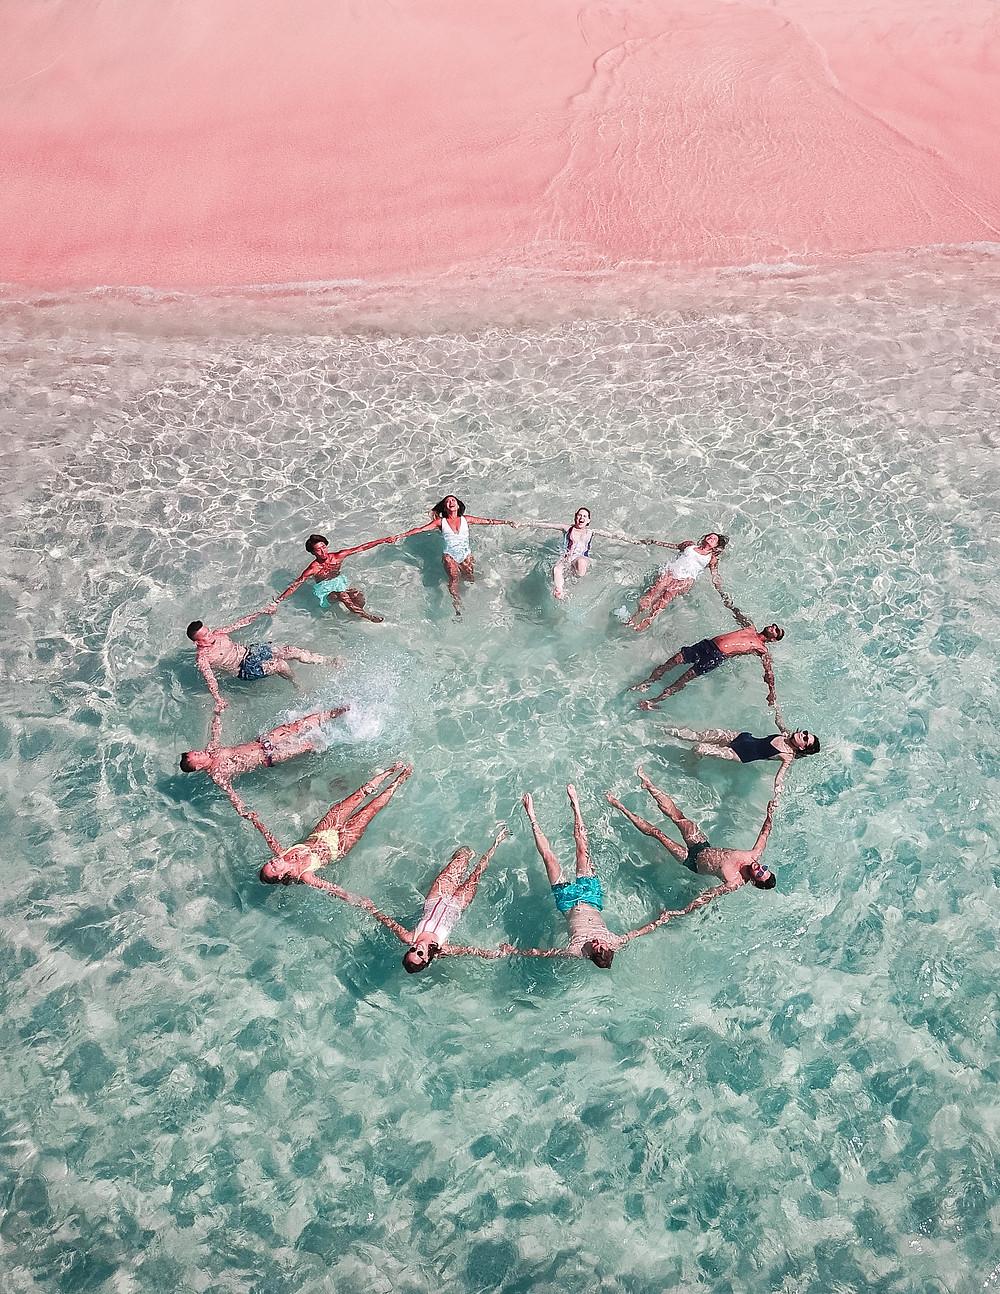 Komodo island Pink Beach. Pink beach Komodo. Komodo island tour pink beach.